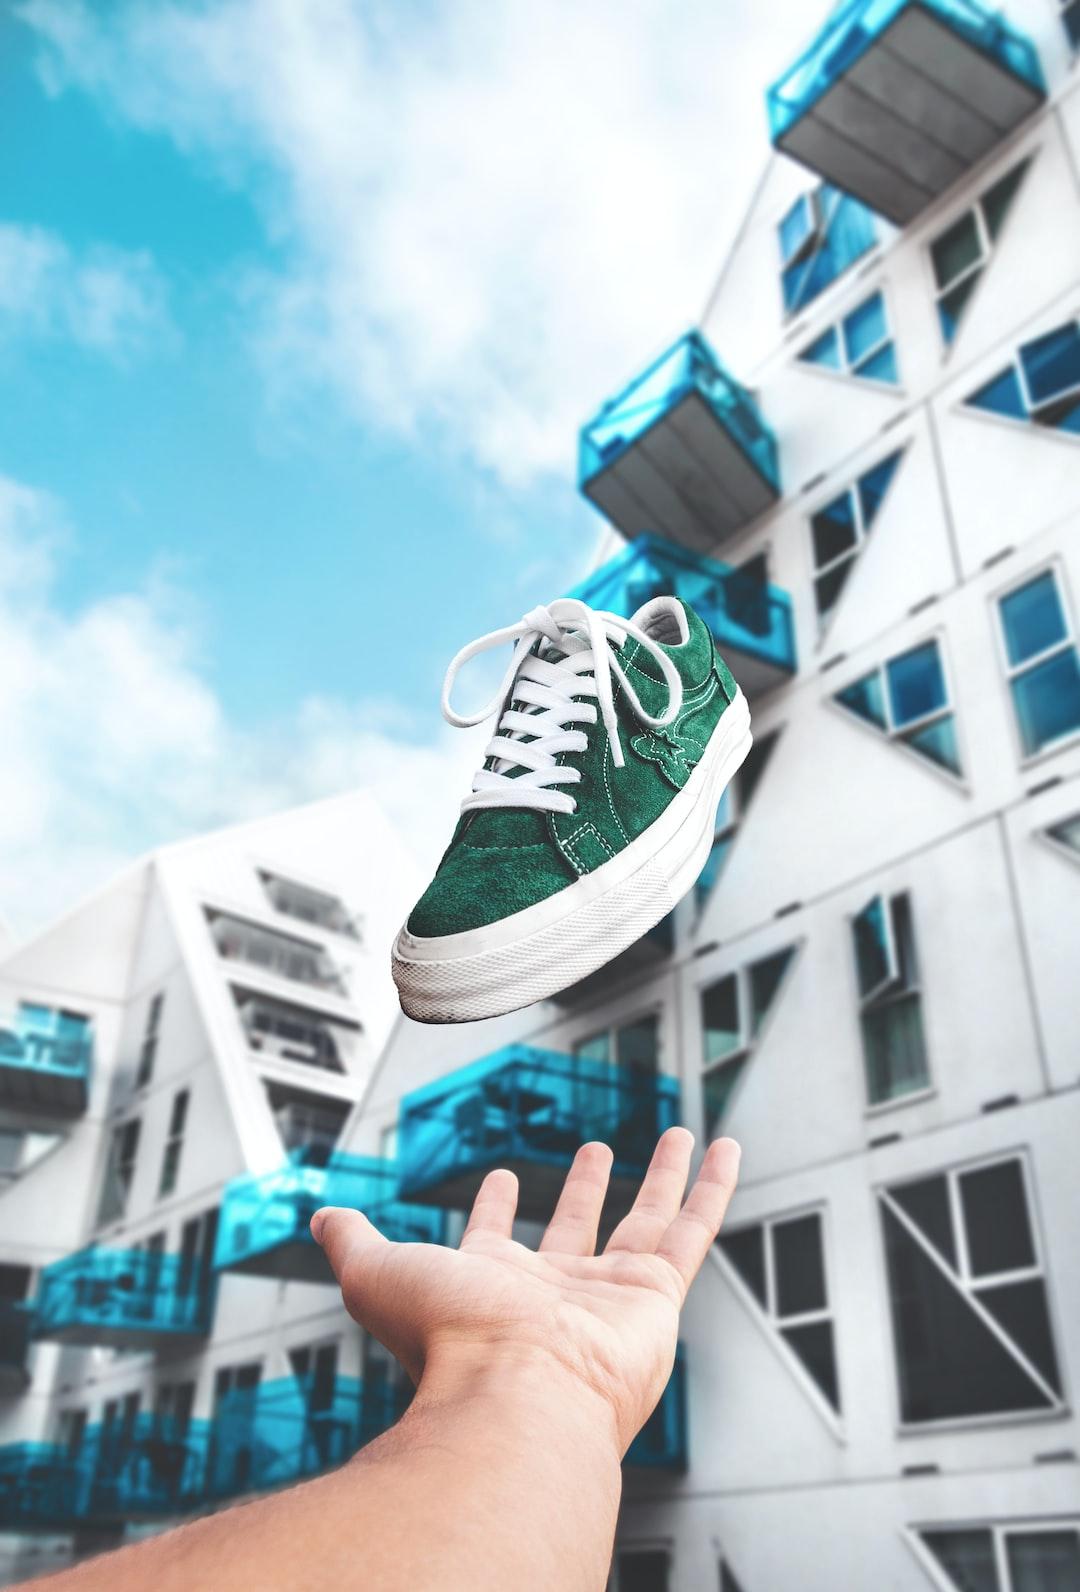 Picture of the Golf Le Fleur & Converse sneaker